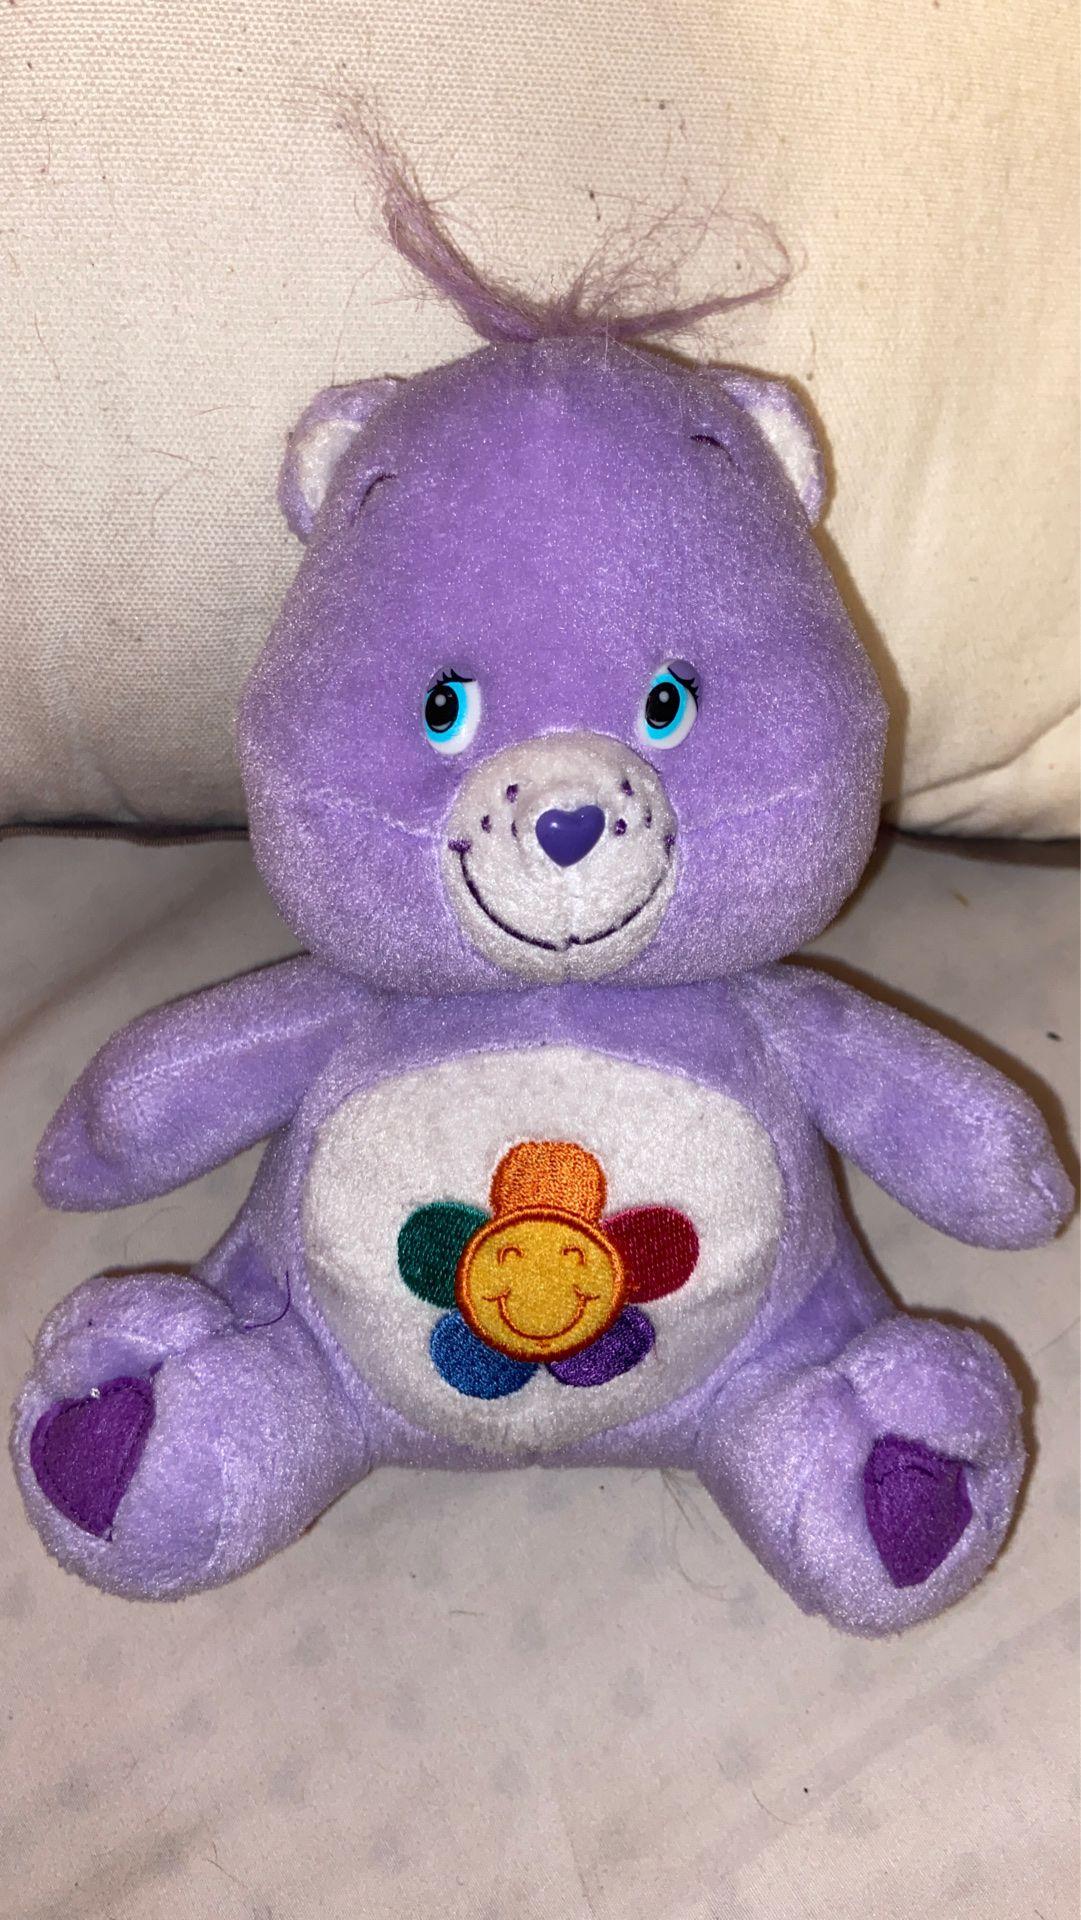 "Care Bears Harmony Bear Plush Stuffed Animal Purple Lavender Flower Tummy 7"""